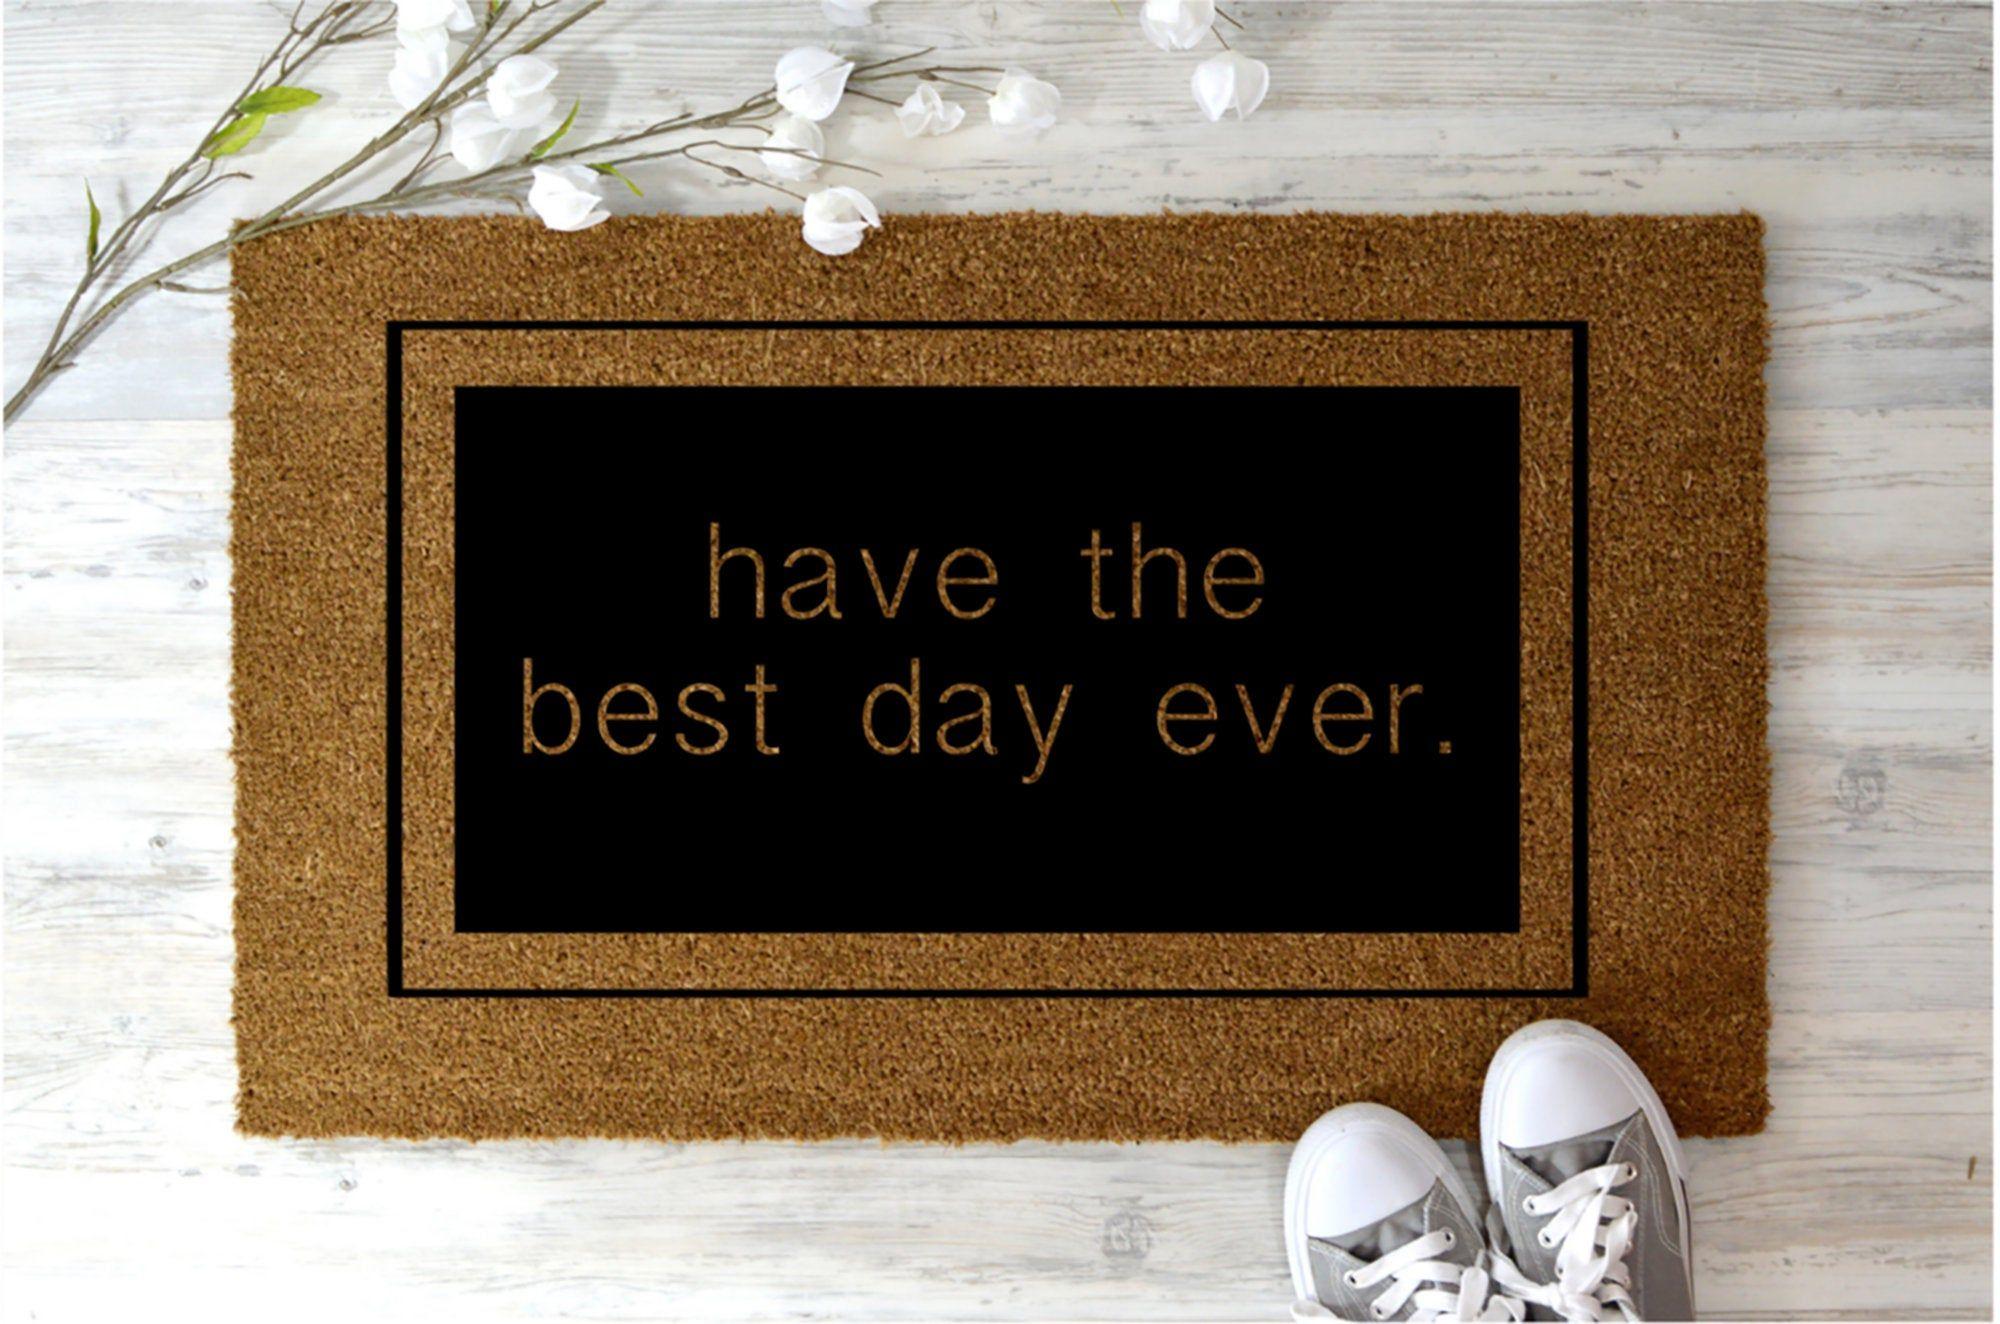 Have The Best Day Ever Doormat Welcome Home Coir Doormat Funny Welcome Mat Funny Welcome Mat Door Mat Funny Doormats